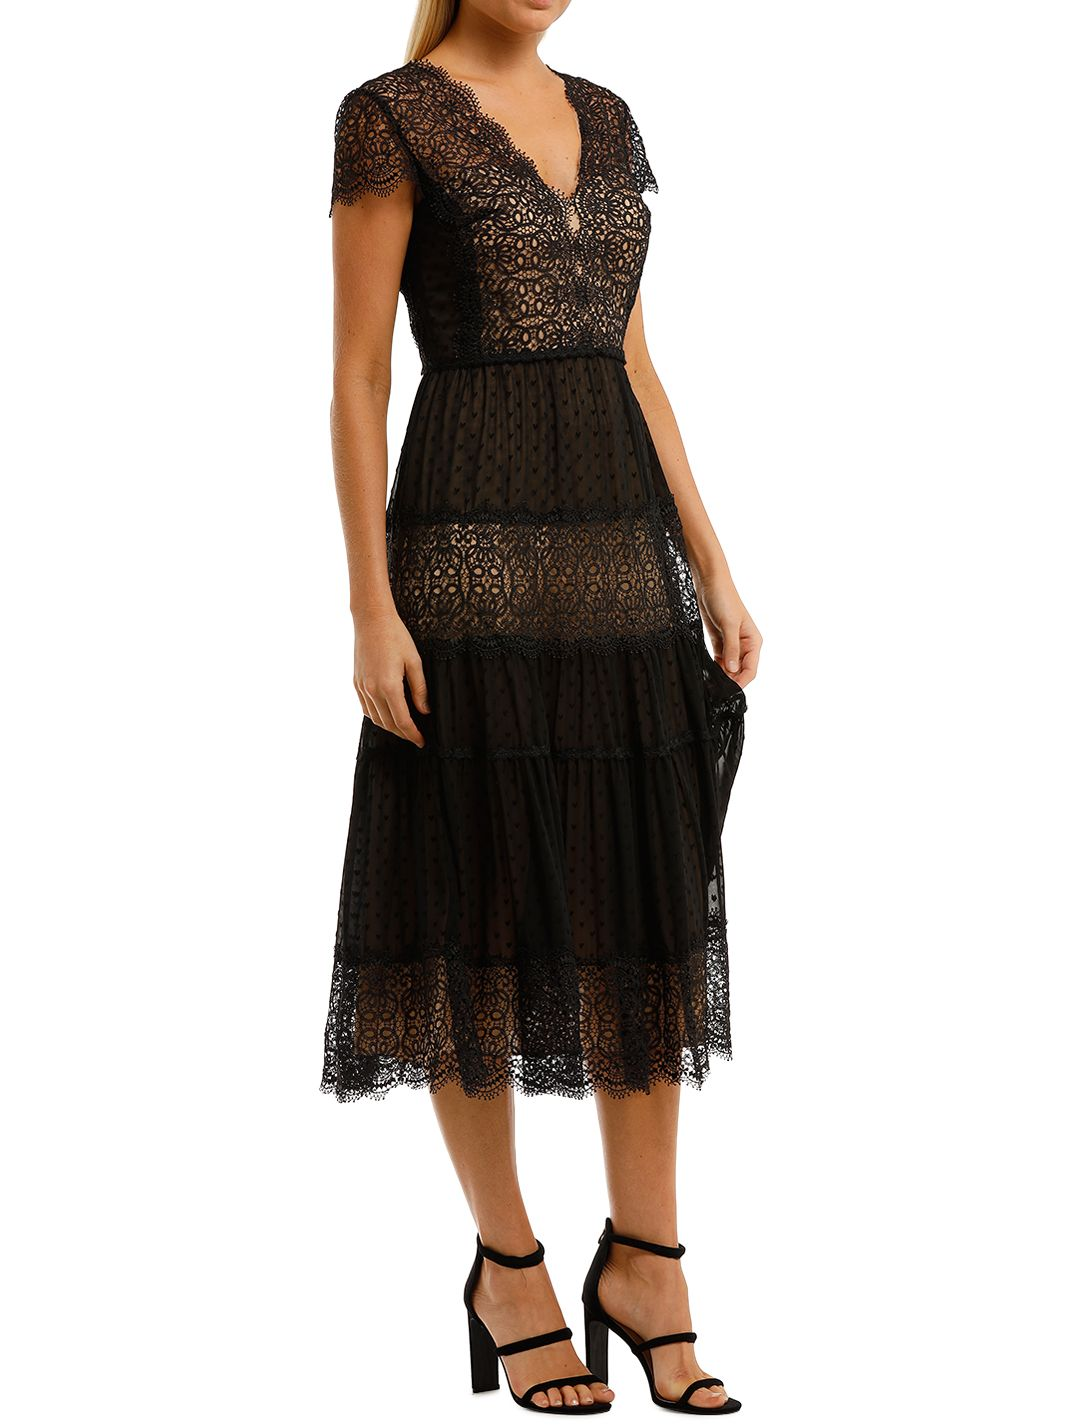 Catherine-Deane-Lala-Dress-Black-Side